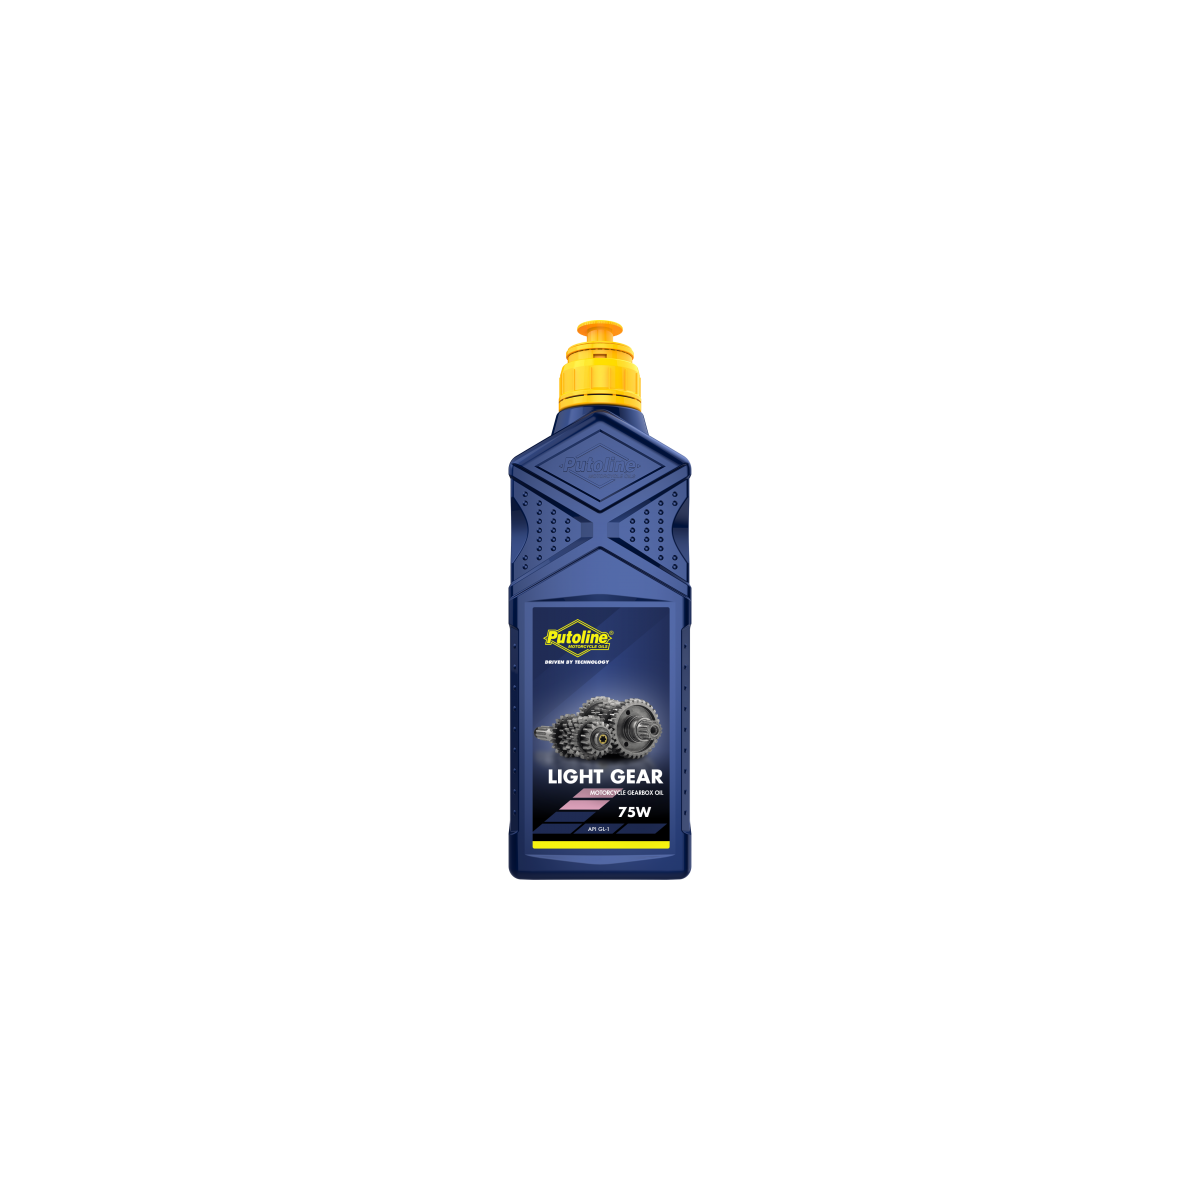 Huile de boite Putoline Gear light 75w 1 Litre